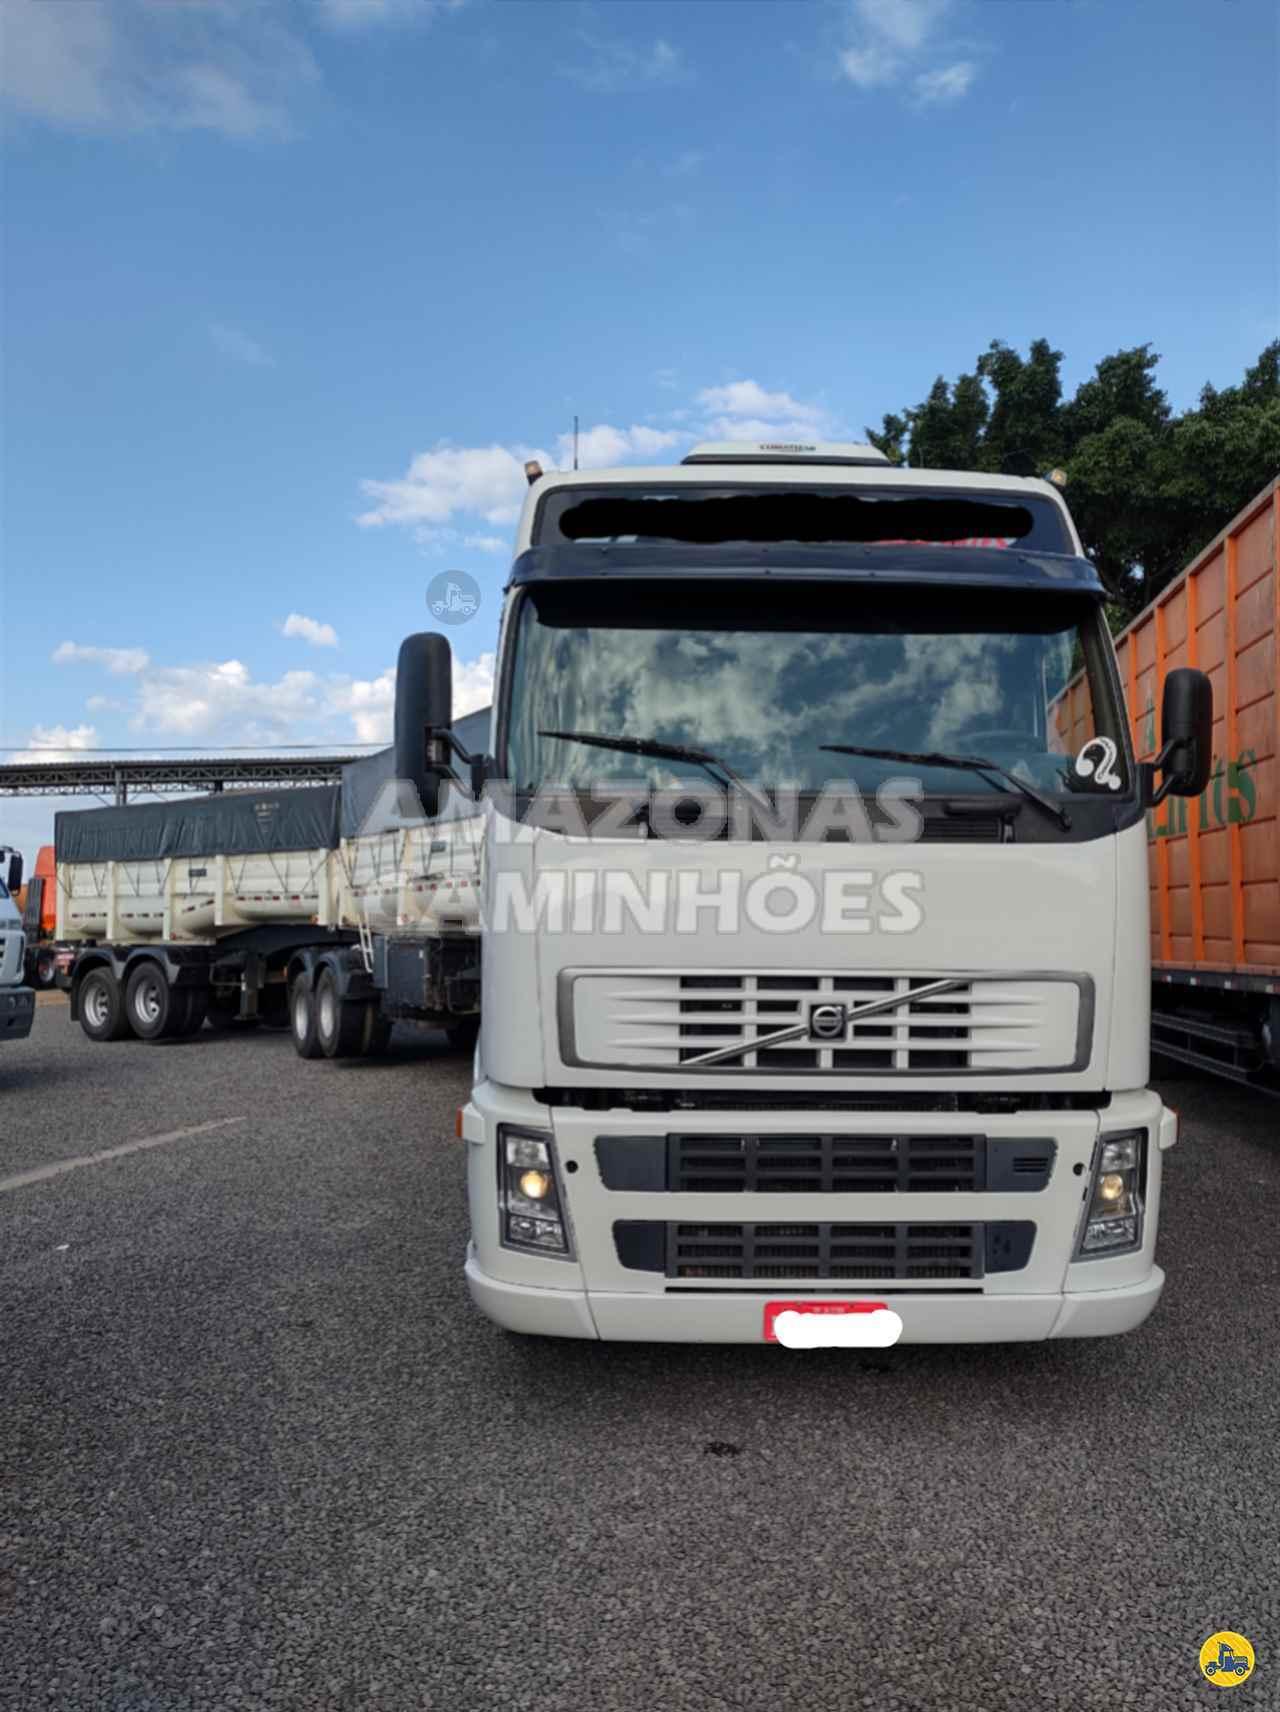 CAMINHAO VOLVO VOLVO FH 400 Cavalo Mecânico Truck 6x2 Amazonas Caminhões - SP MARILIA SÃO PAULO SP